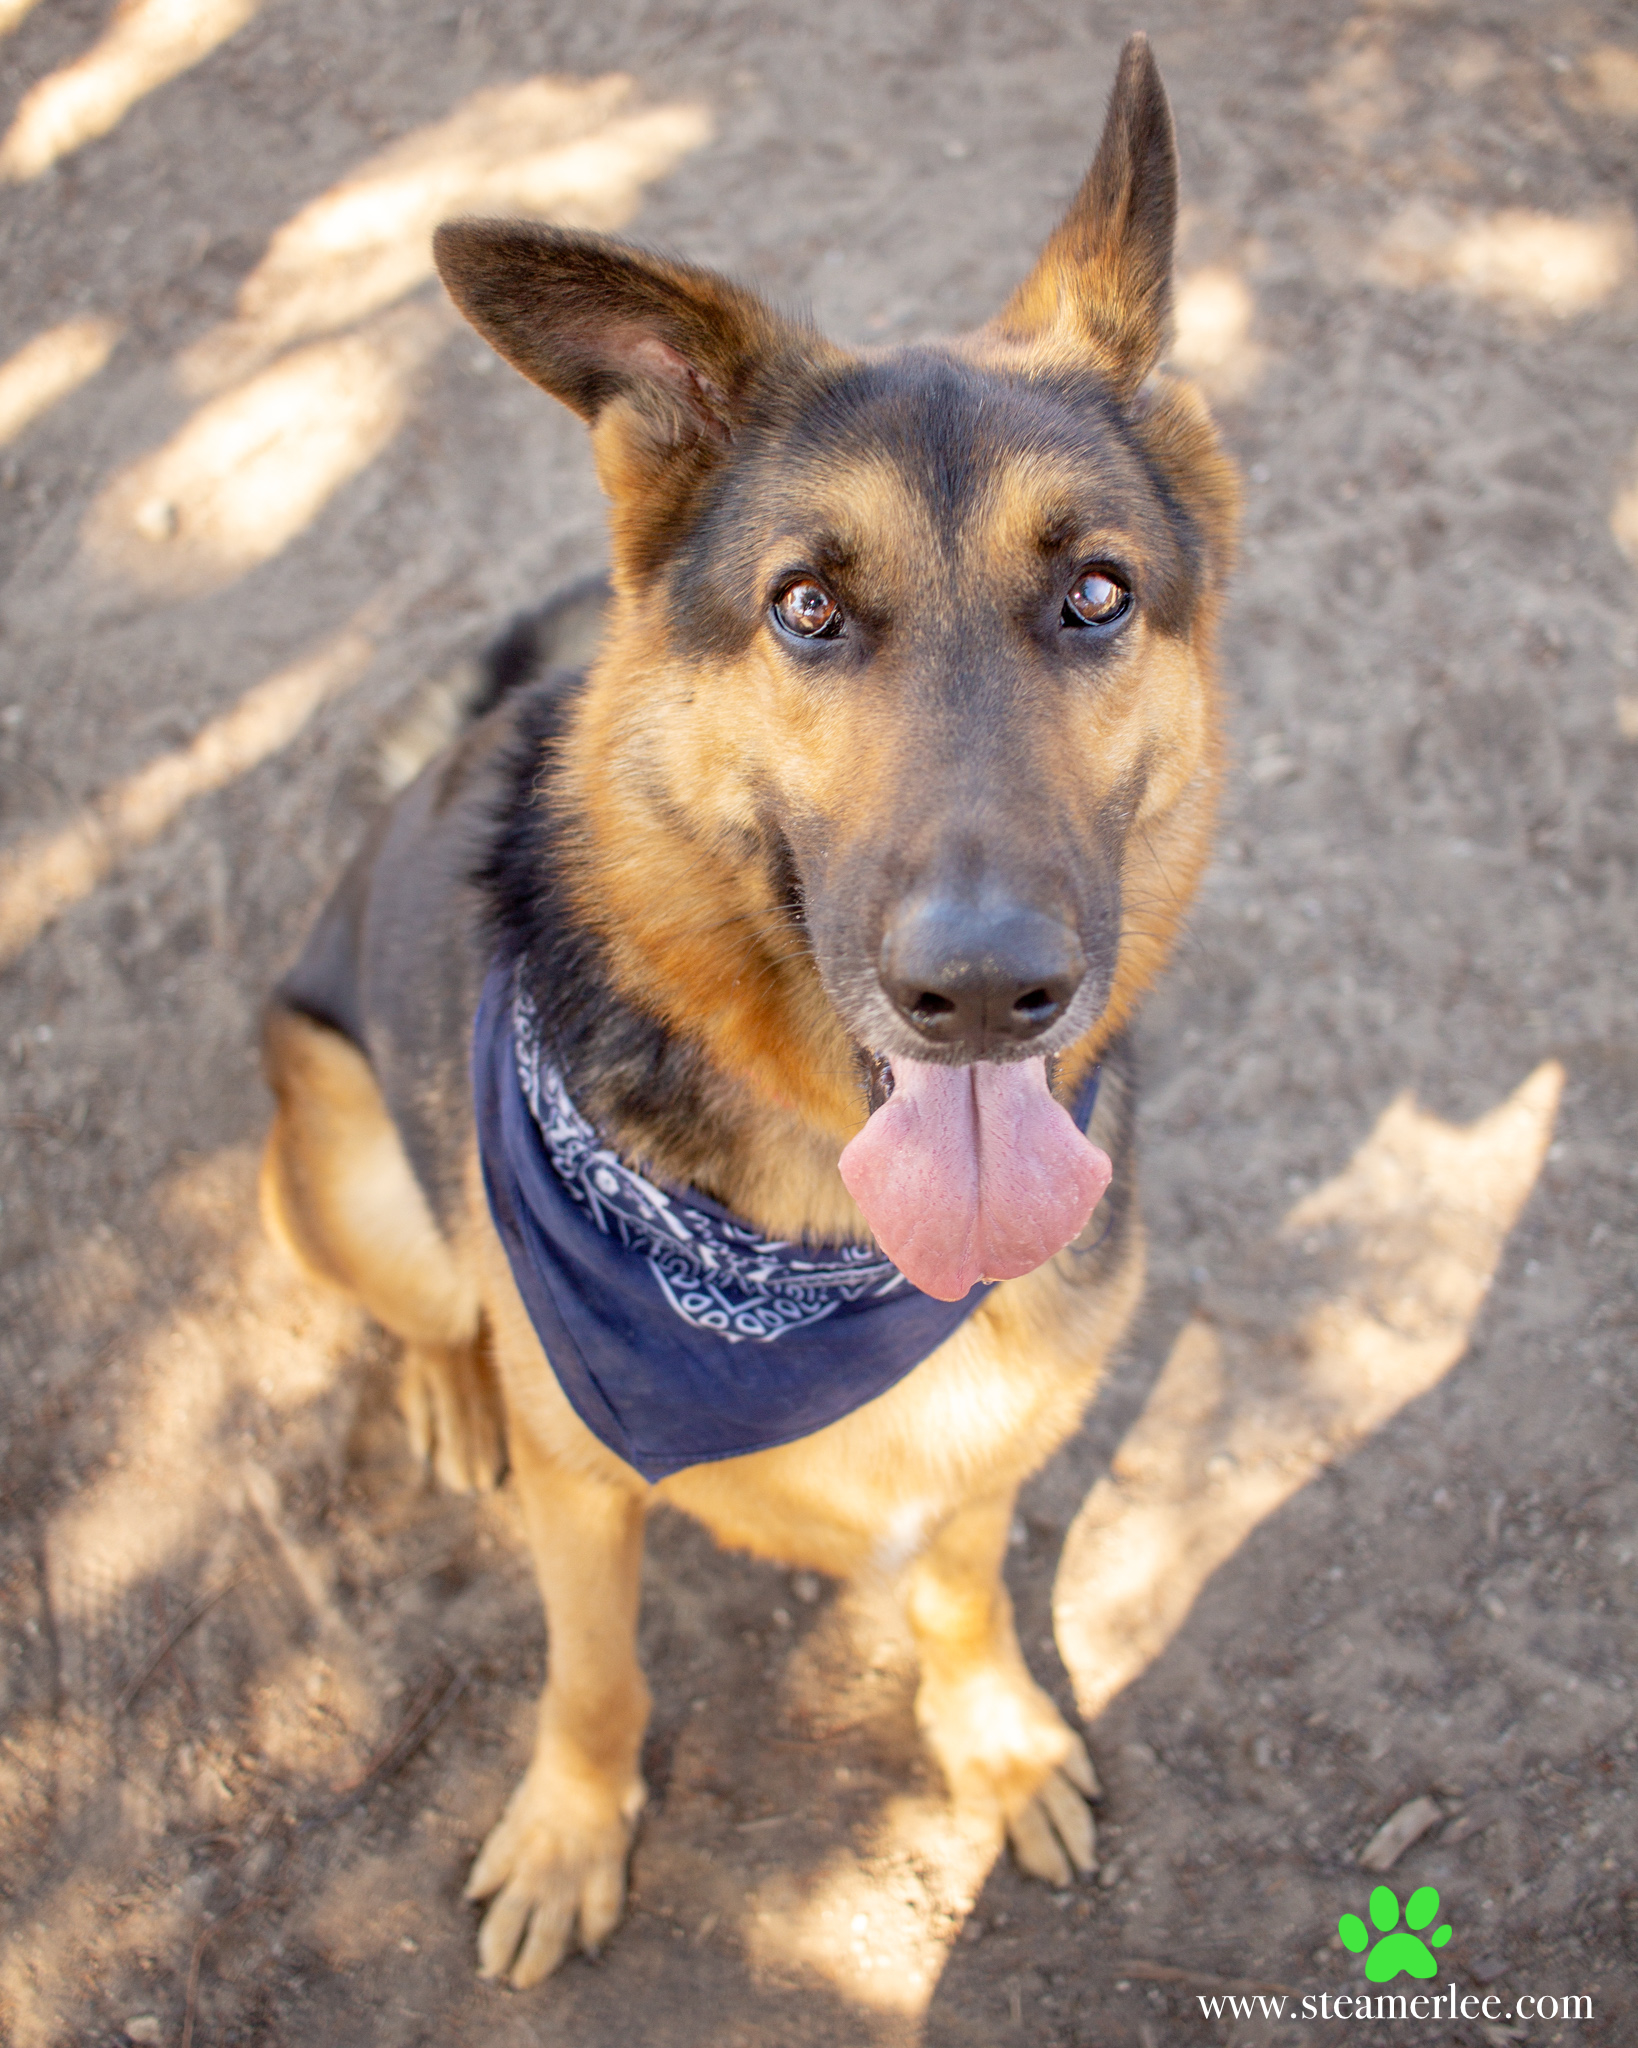 471-Orange-County-Dog-Photography-Steamer-Lee-Southern-California-SBACC.JPG